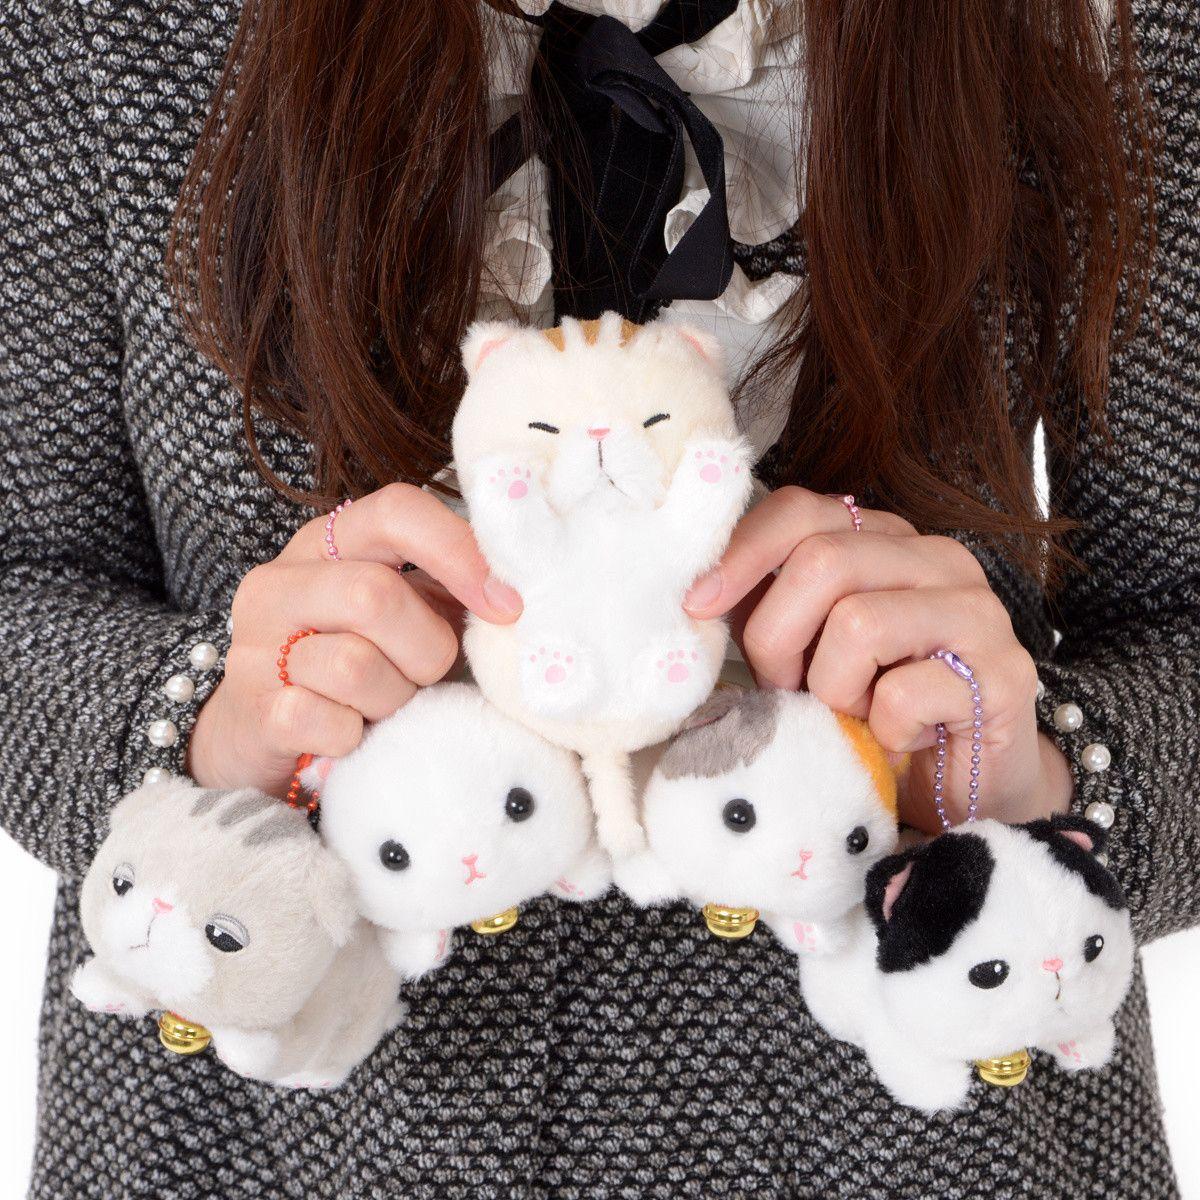 Utatane Munchkin Cat Plush Collection Ball Chain Cat Plush Munchkin Cat Cute Stuffed Animals